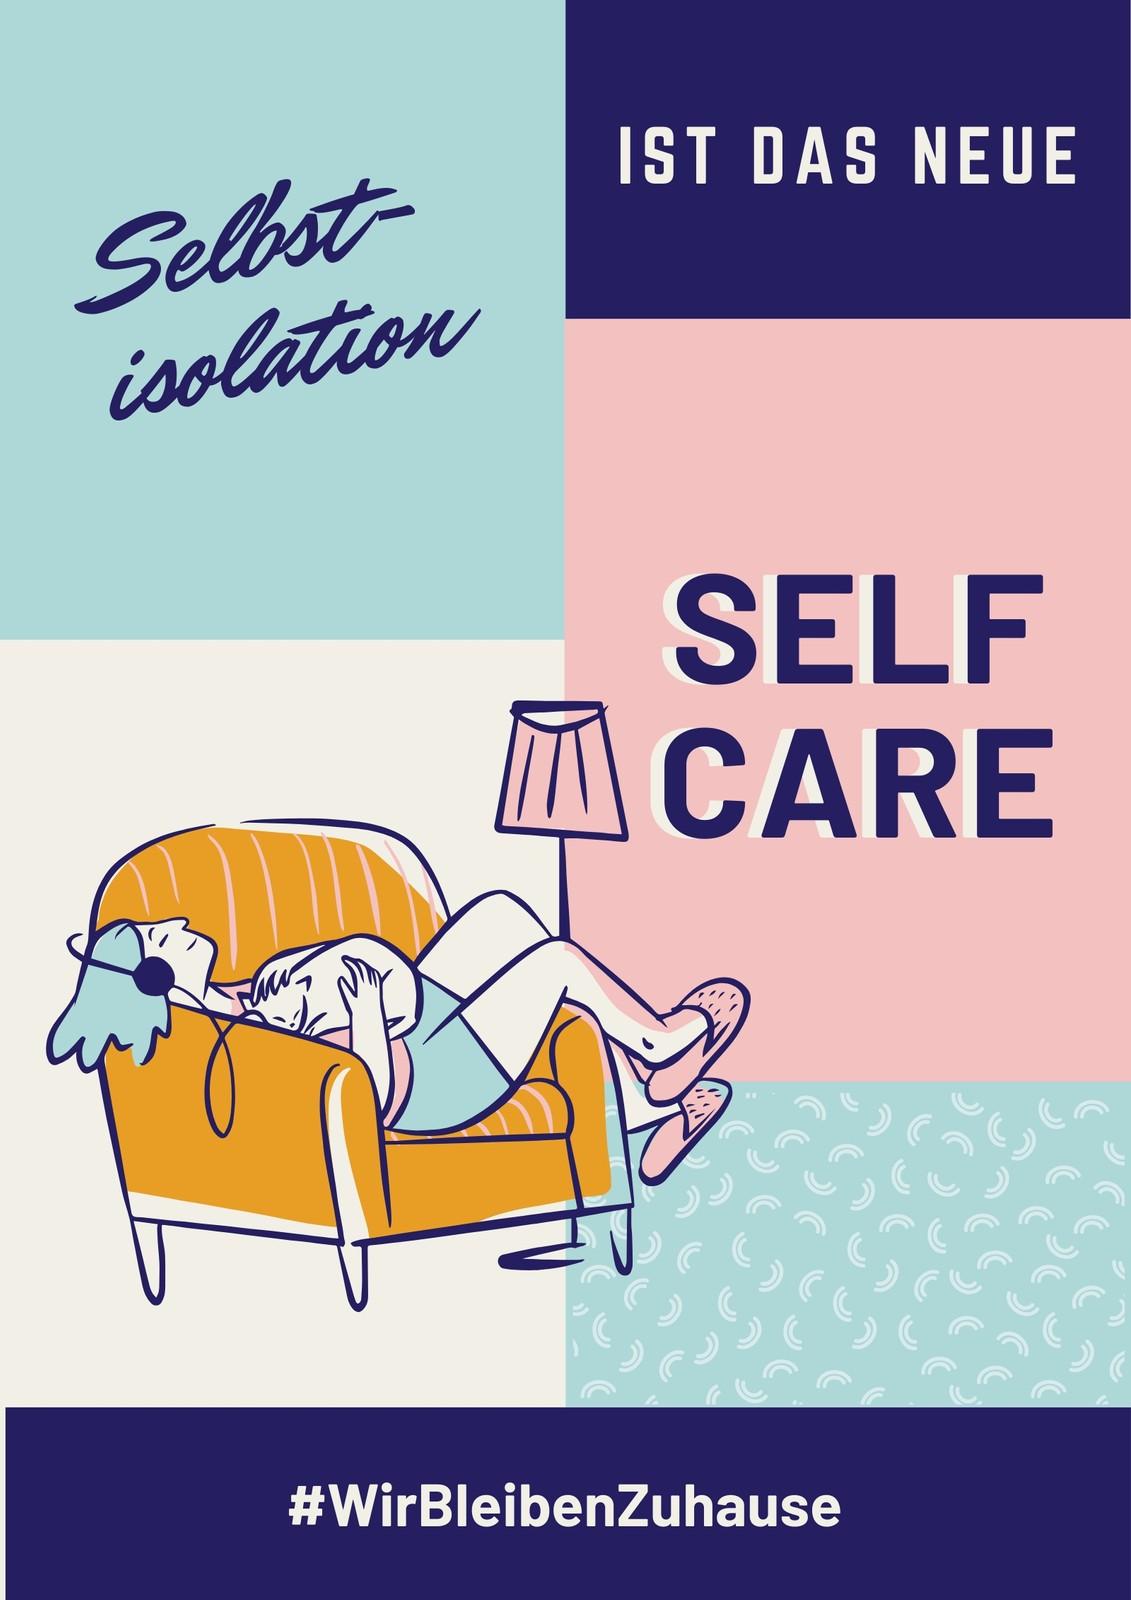 Blau-pinkes Selbstisolation & Self-Care Gesundheits-Poster